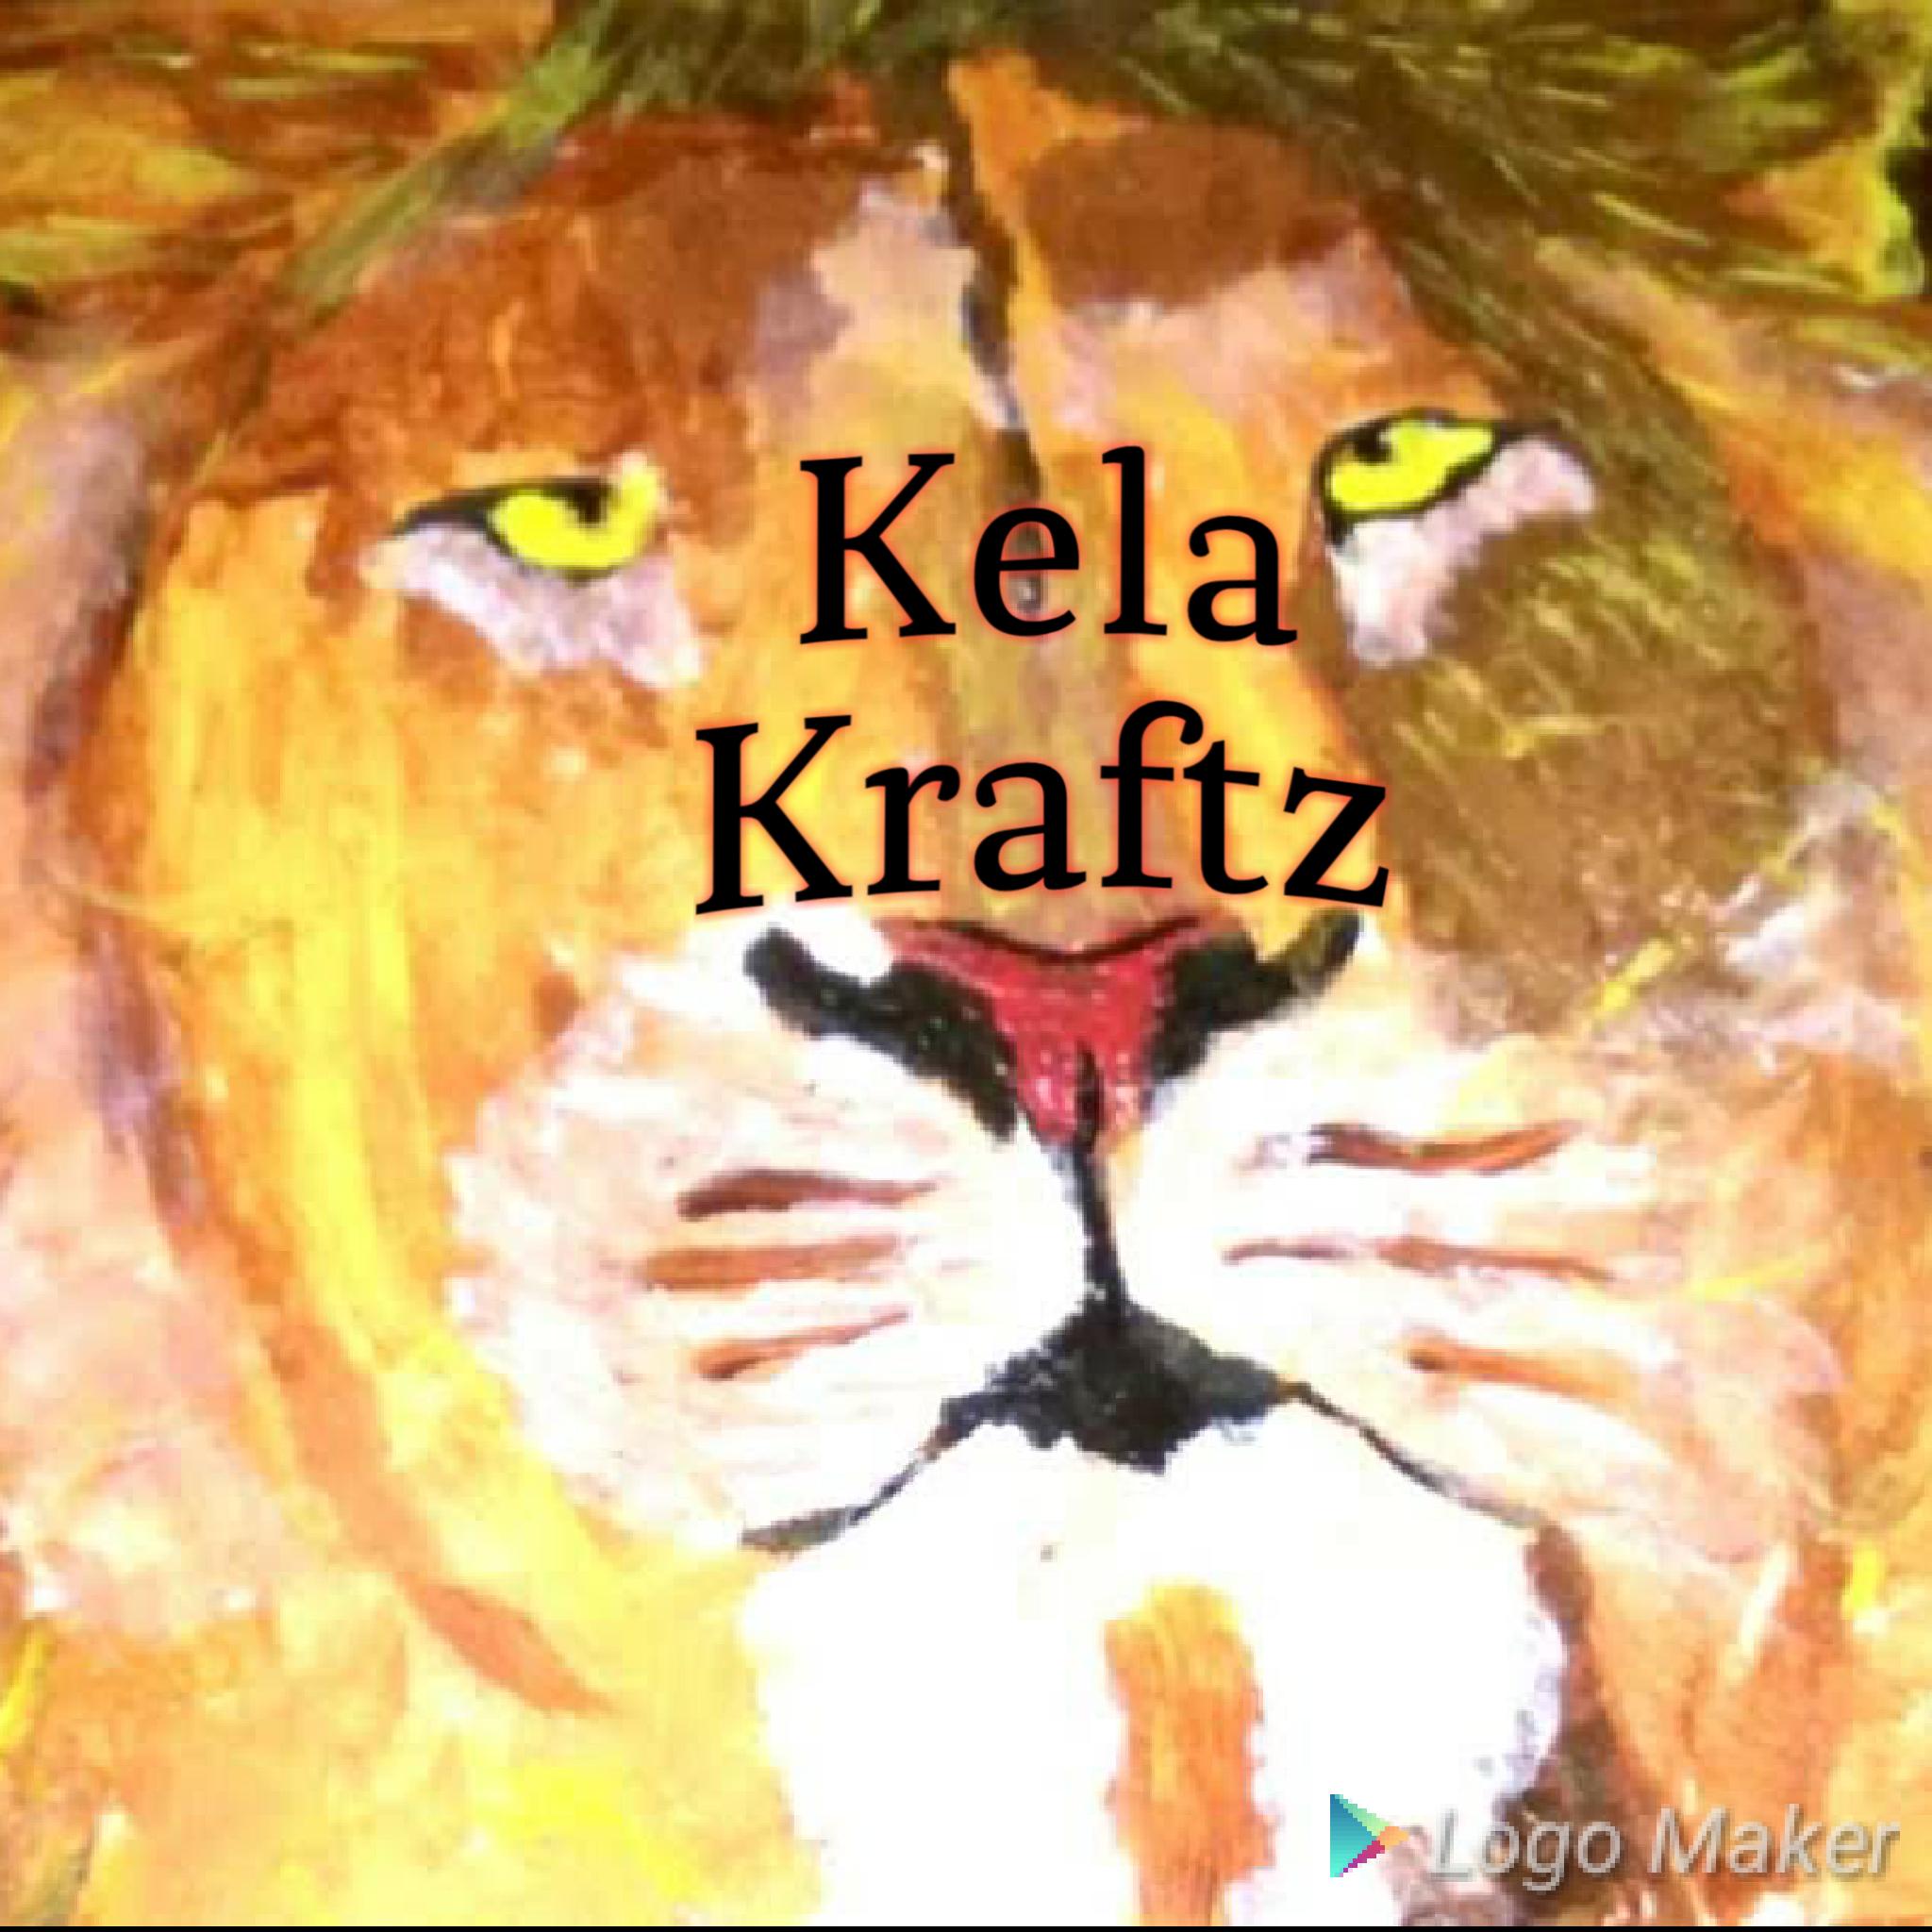 Kela Kraftz